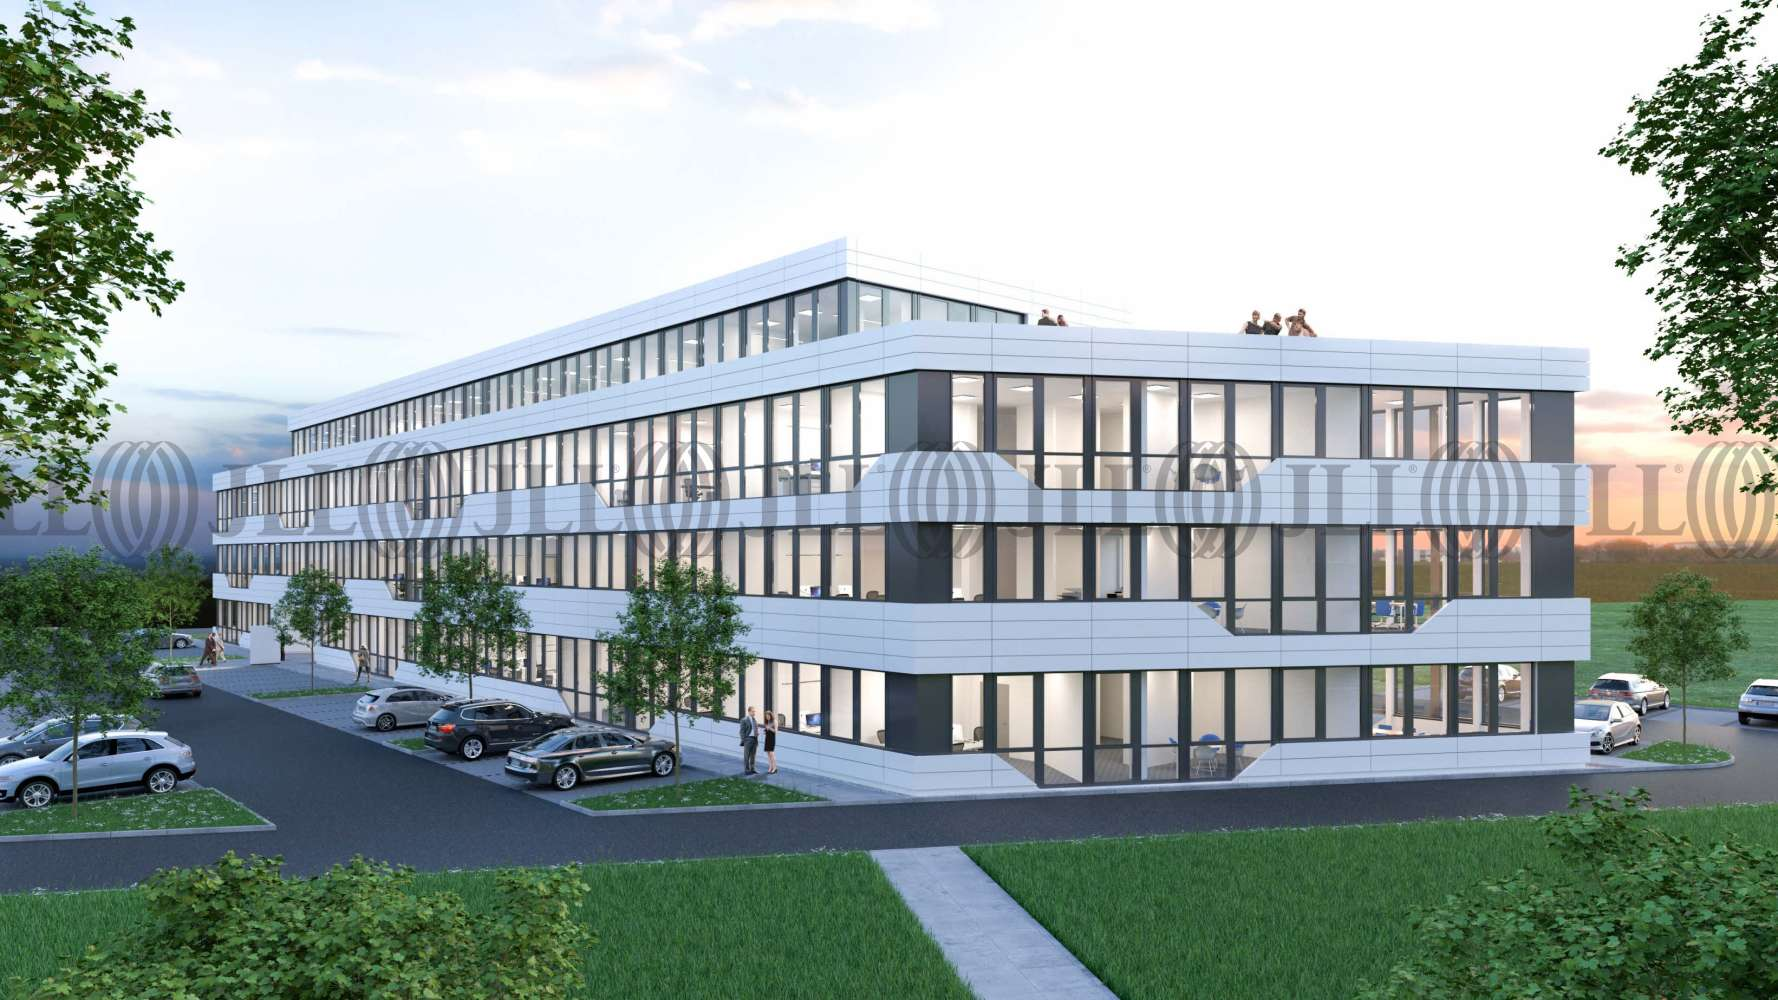 Büros Langenfeld (rheinland), 40764 - Büro - Langenfeld (Rheinland), Berghausen - D2339 - 9575390